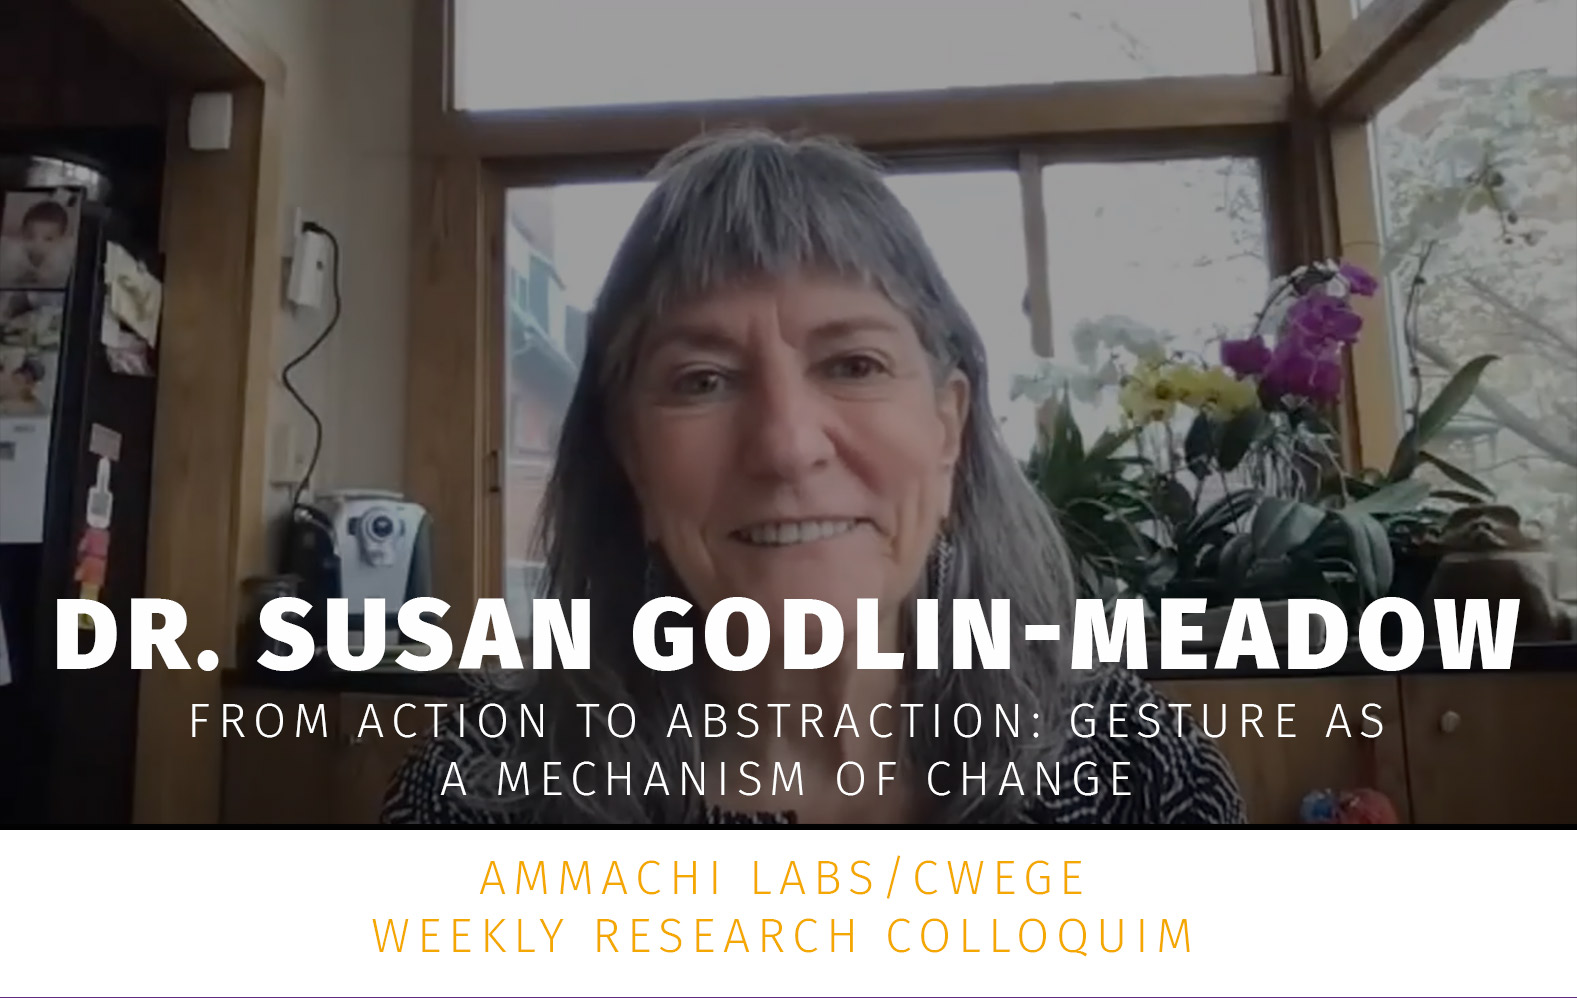 Dr. Susan Godlin Meadows talk